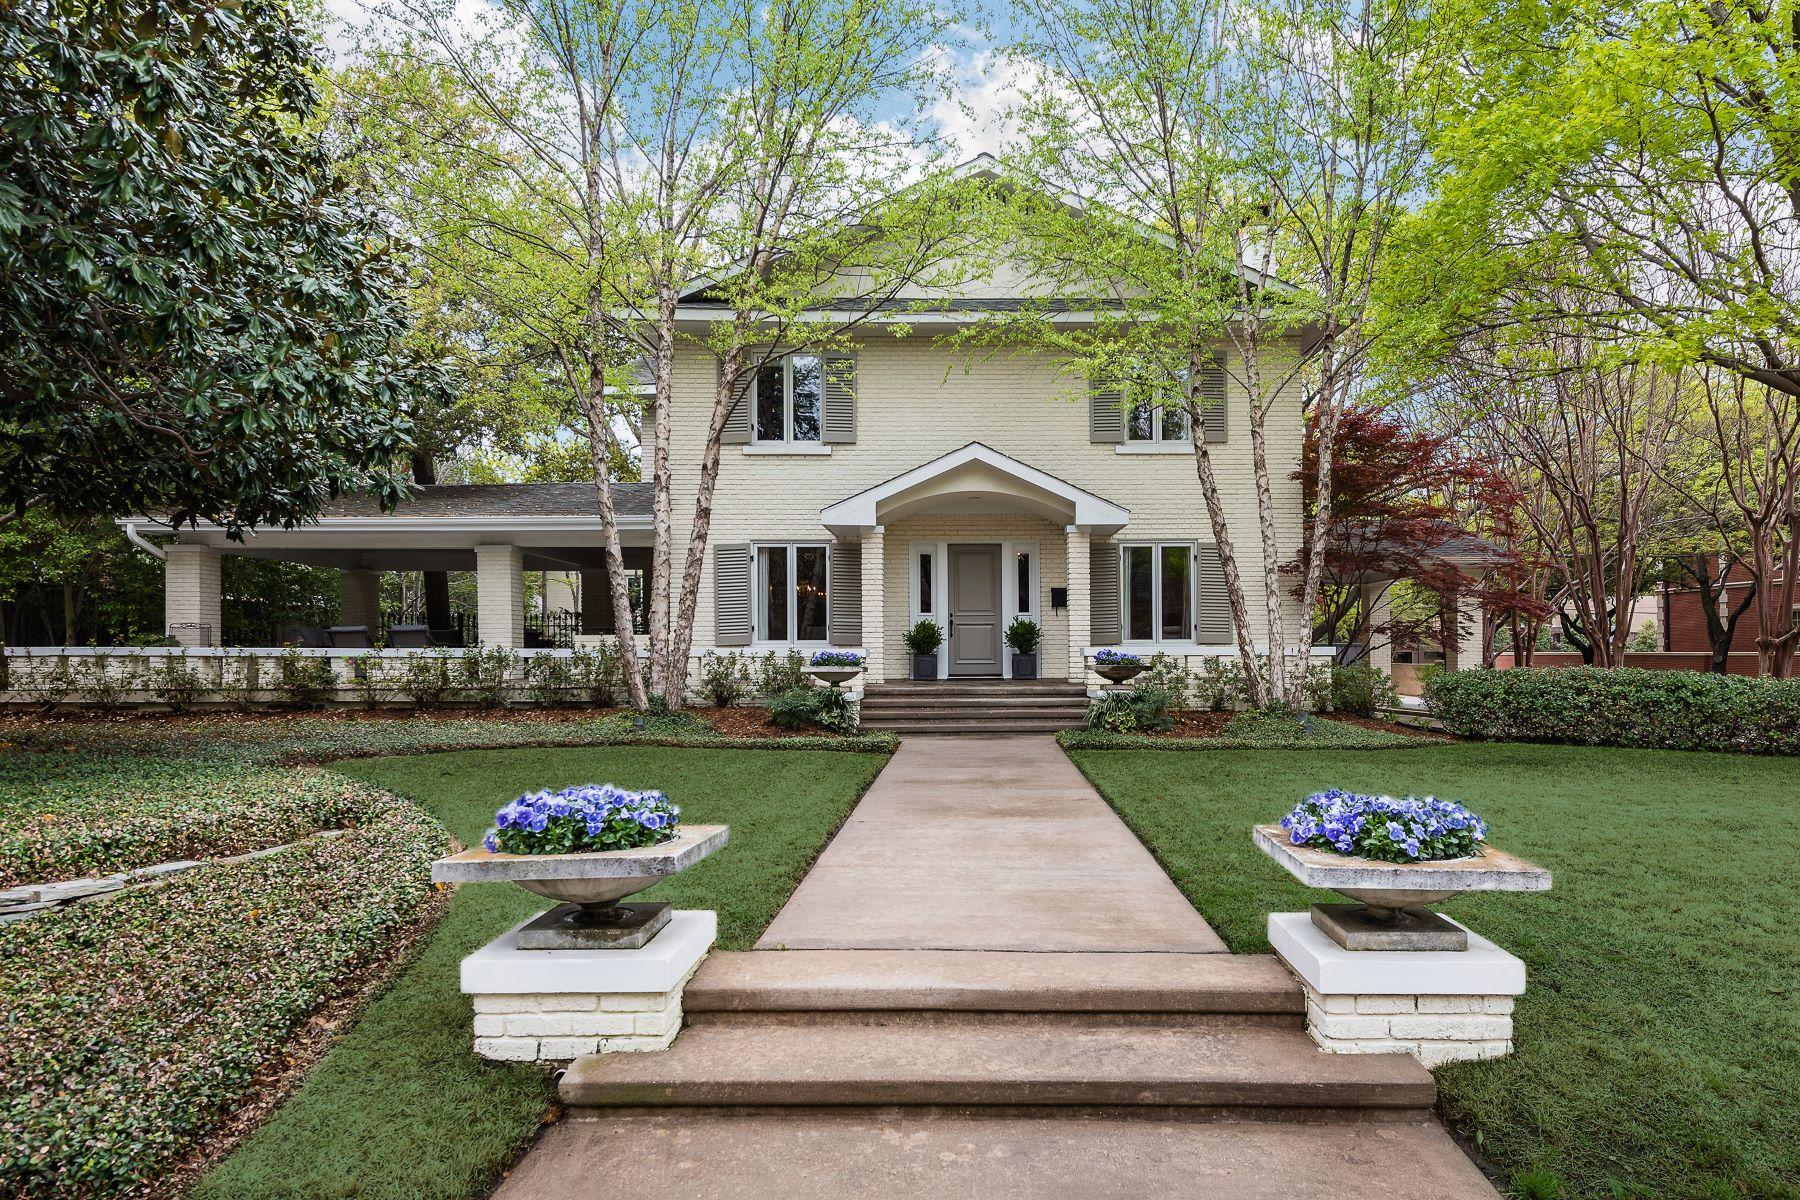 Property للـ Sale في Historic Old Highland Park Home 3517 Gillon Avenue, Highland Park, Texas 75205 United States